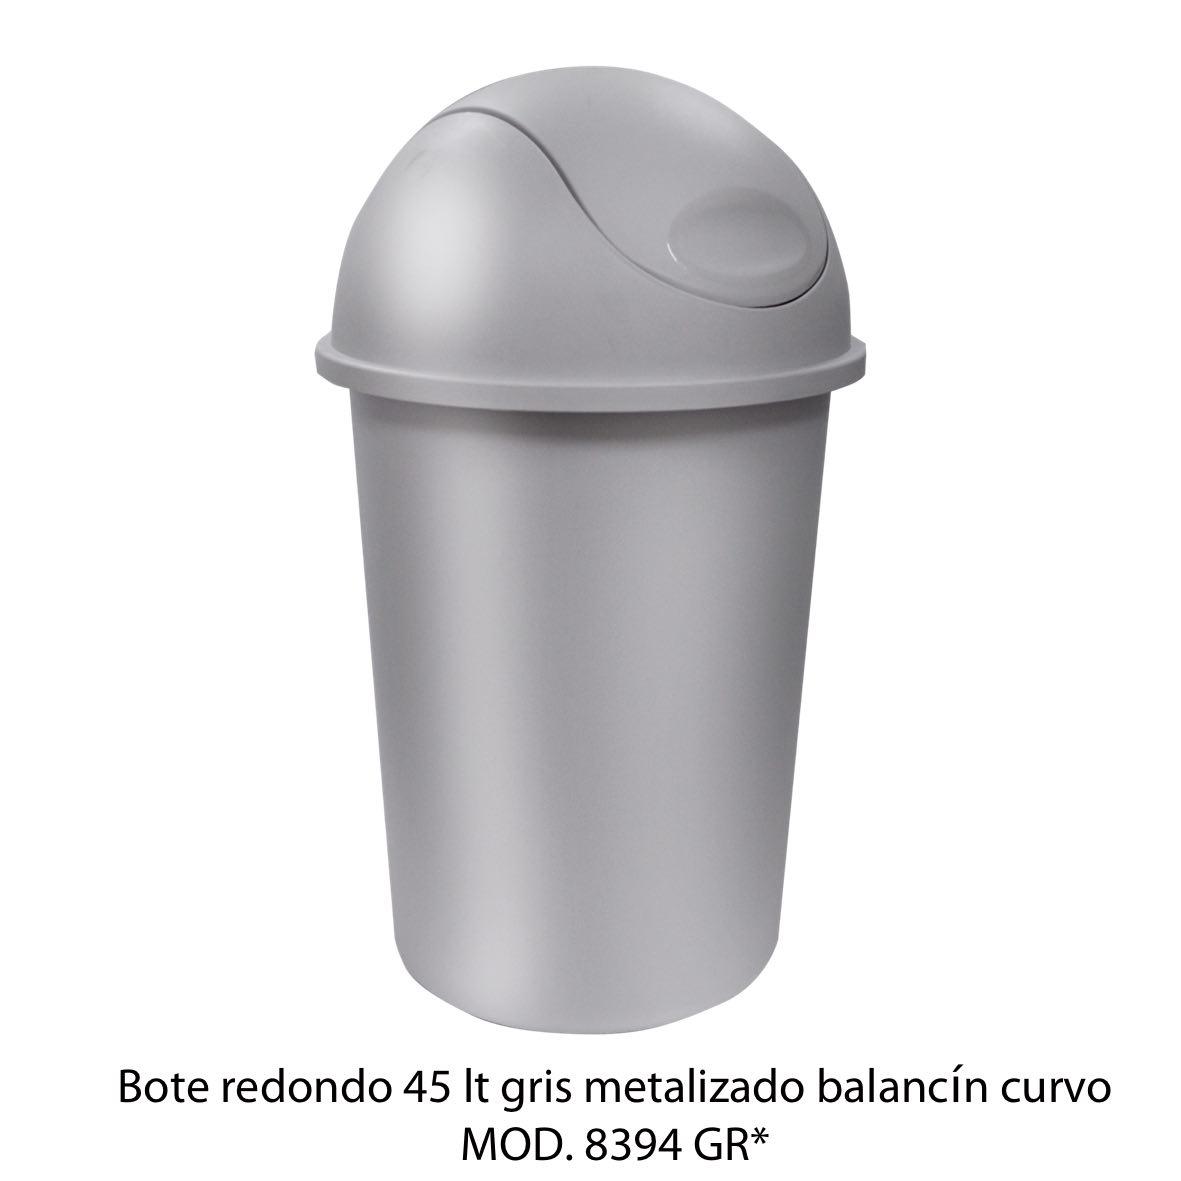 Bote de basura redondo de 45 litros con balancín curvo color gris metalizado modelo 8394 GR - Sablón